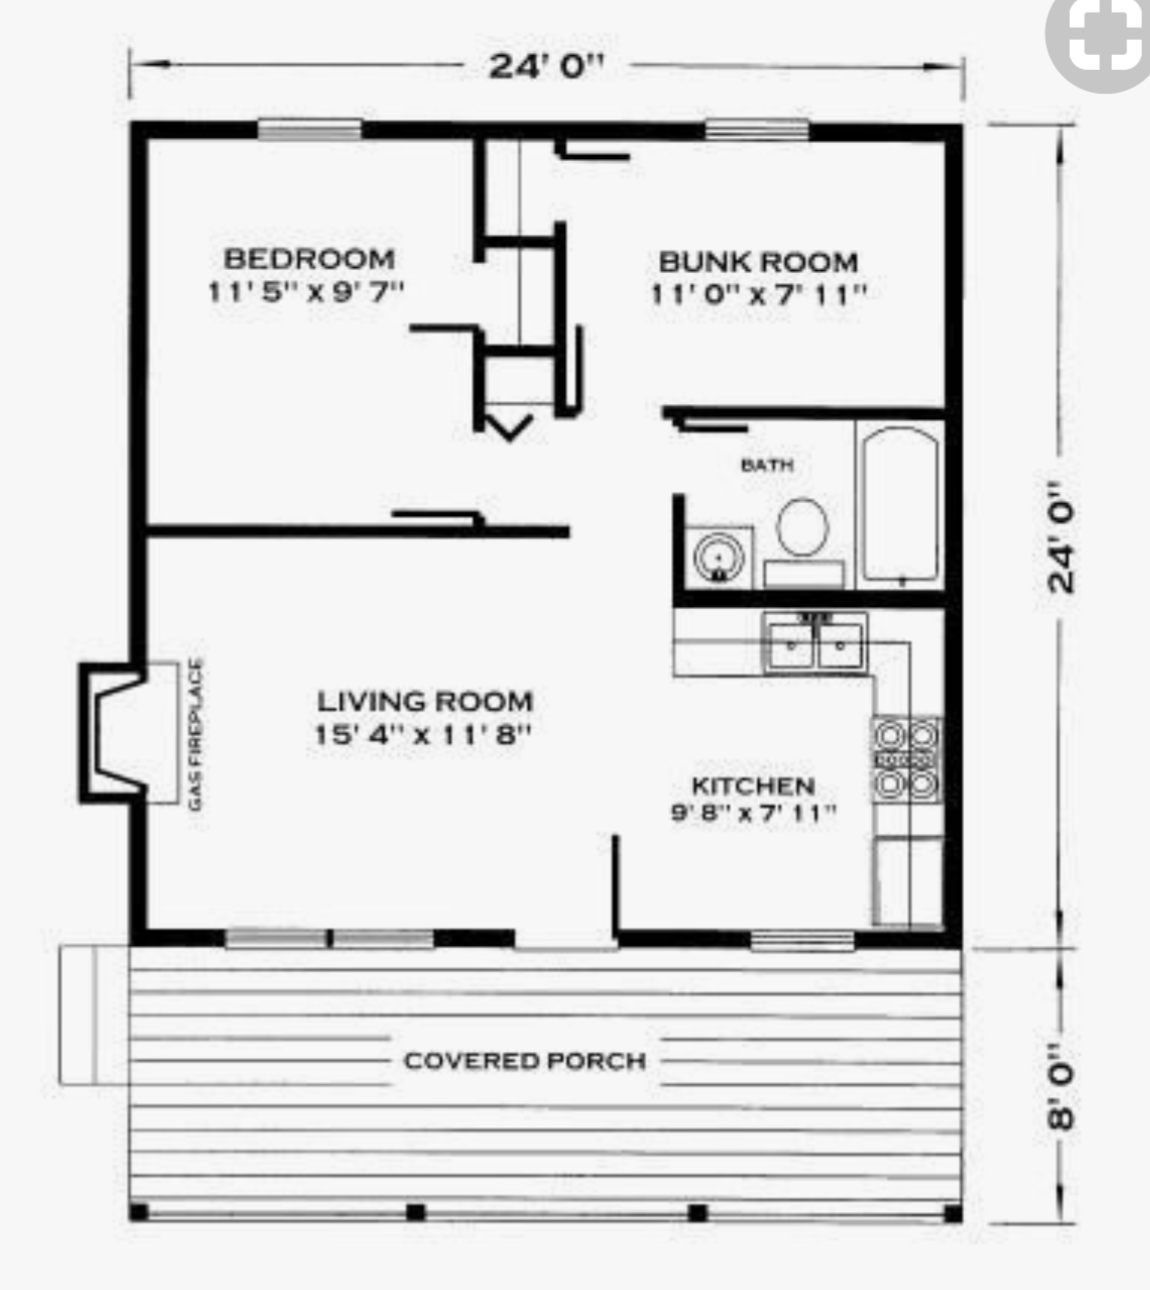 24x24 simple plan